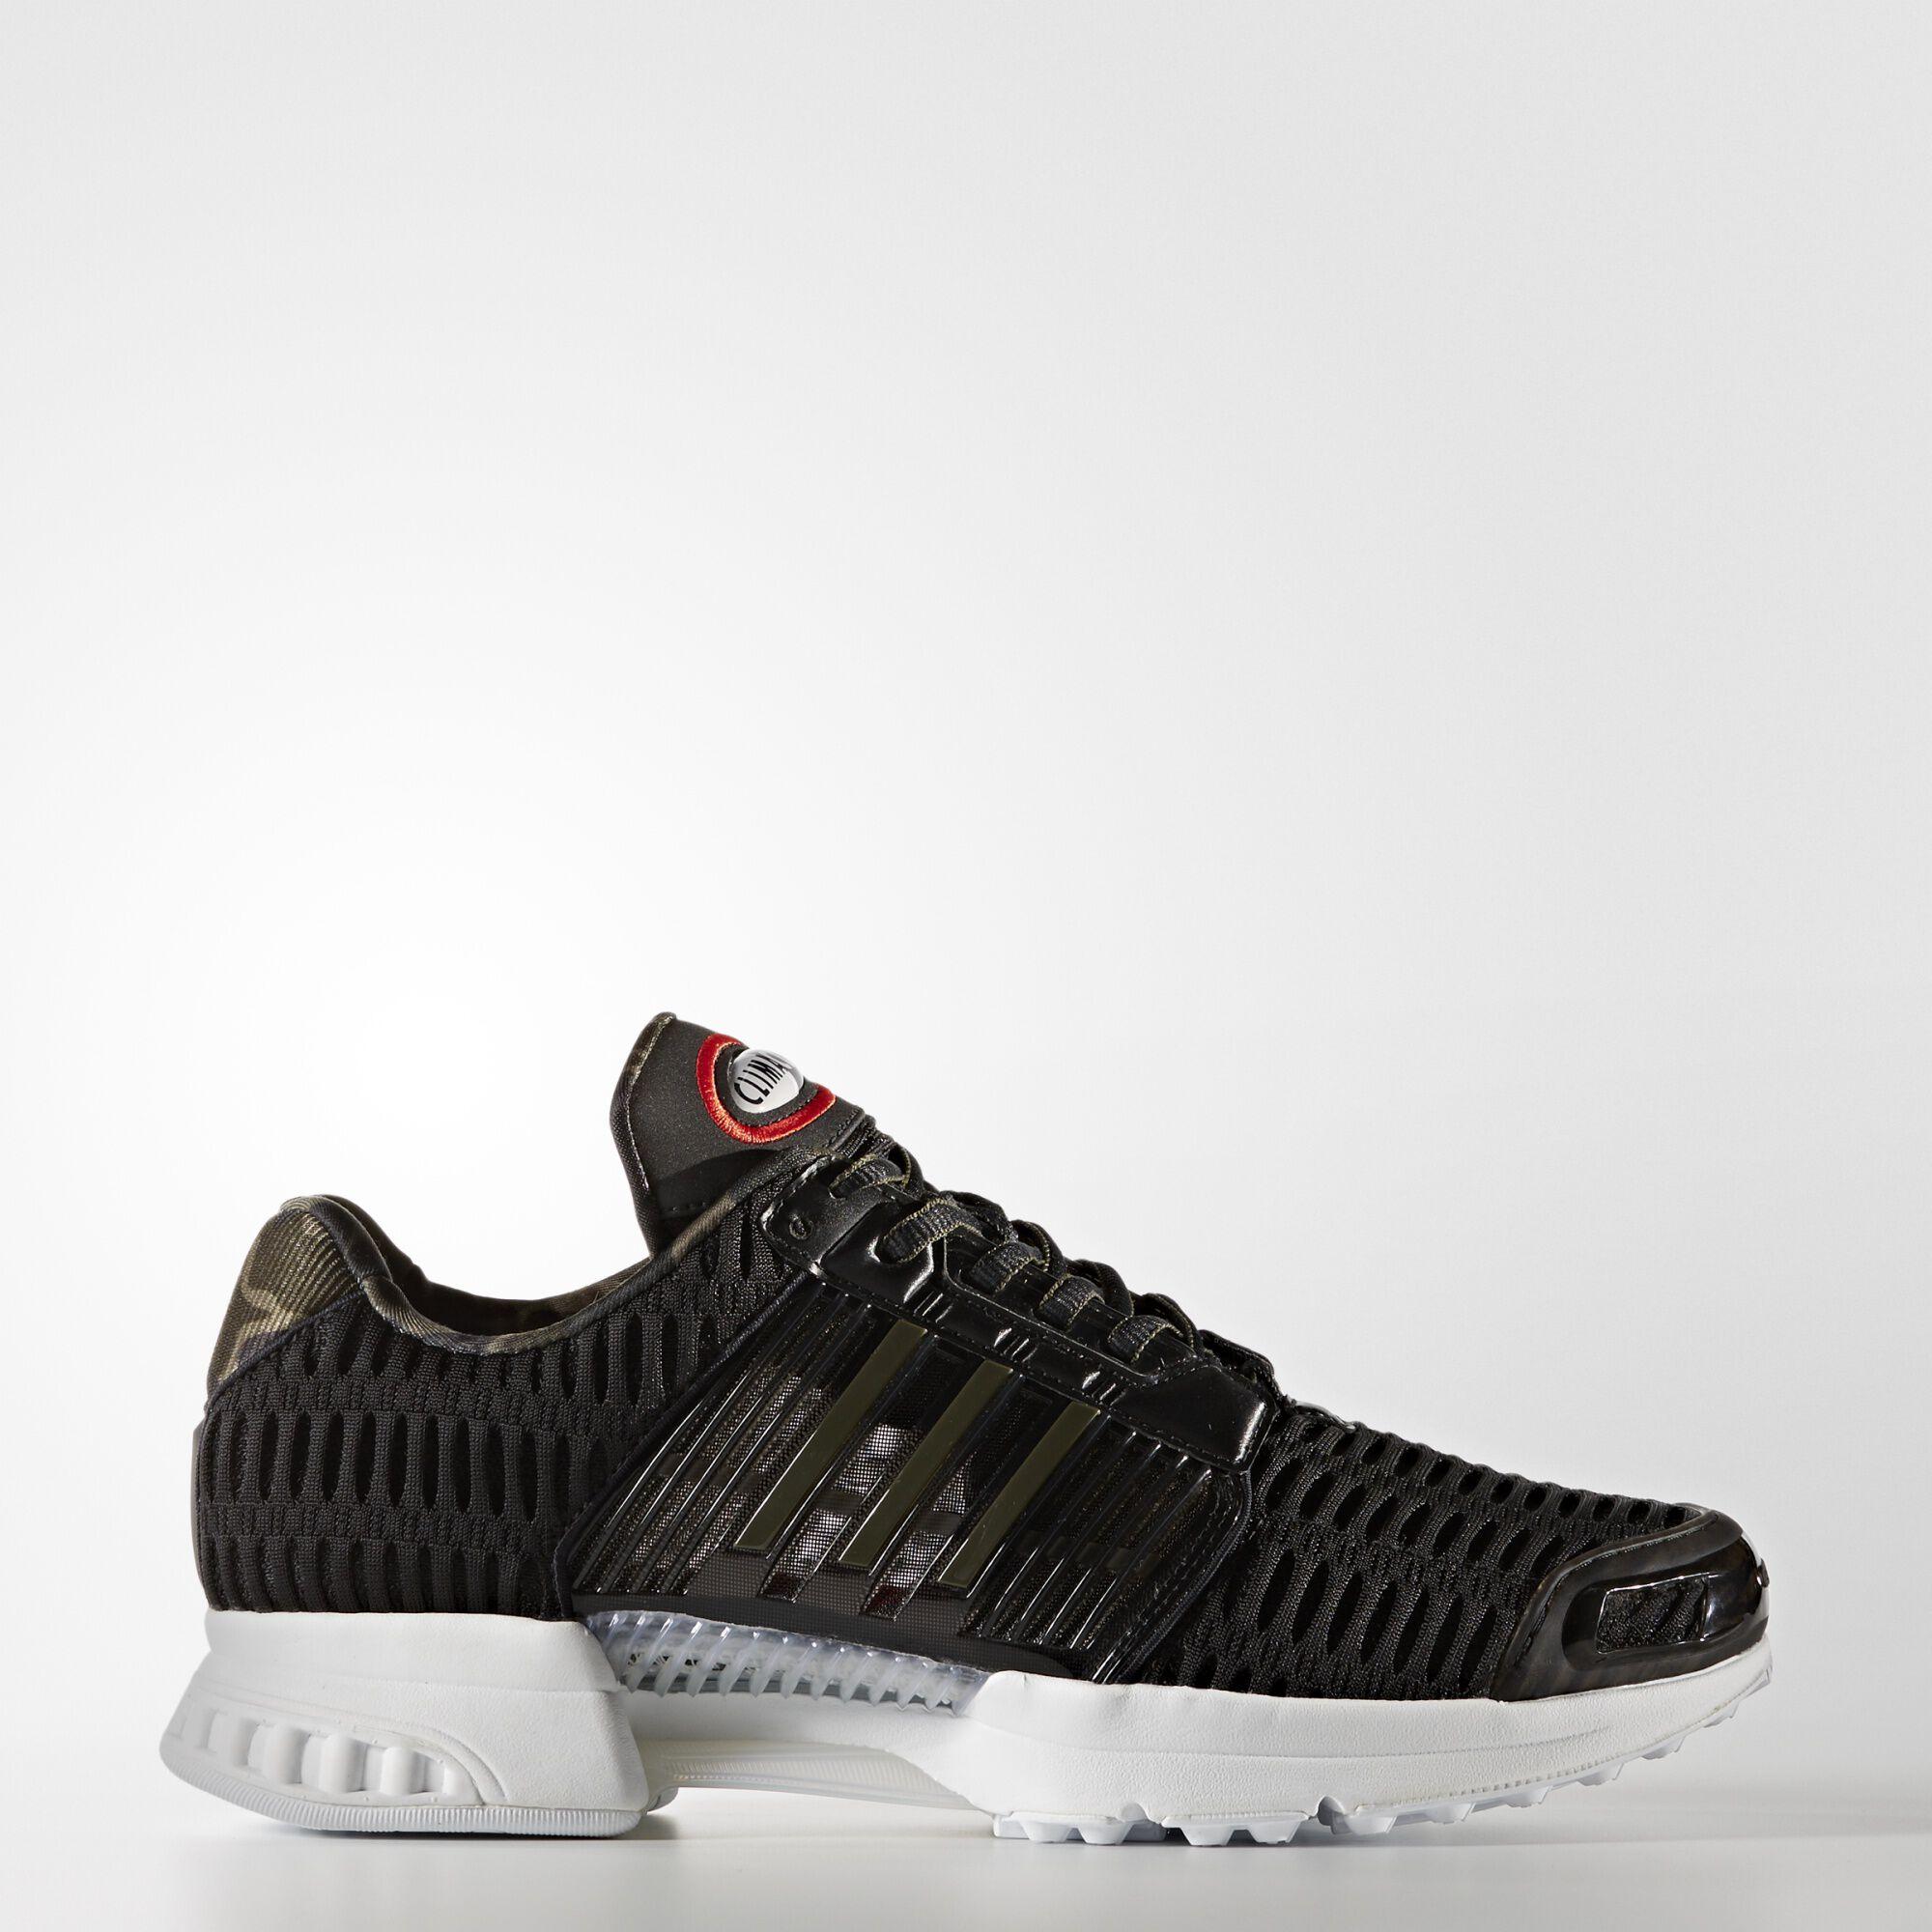 adidas - Climacool 1 Shoes Core Black / Running White BA7177